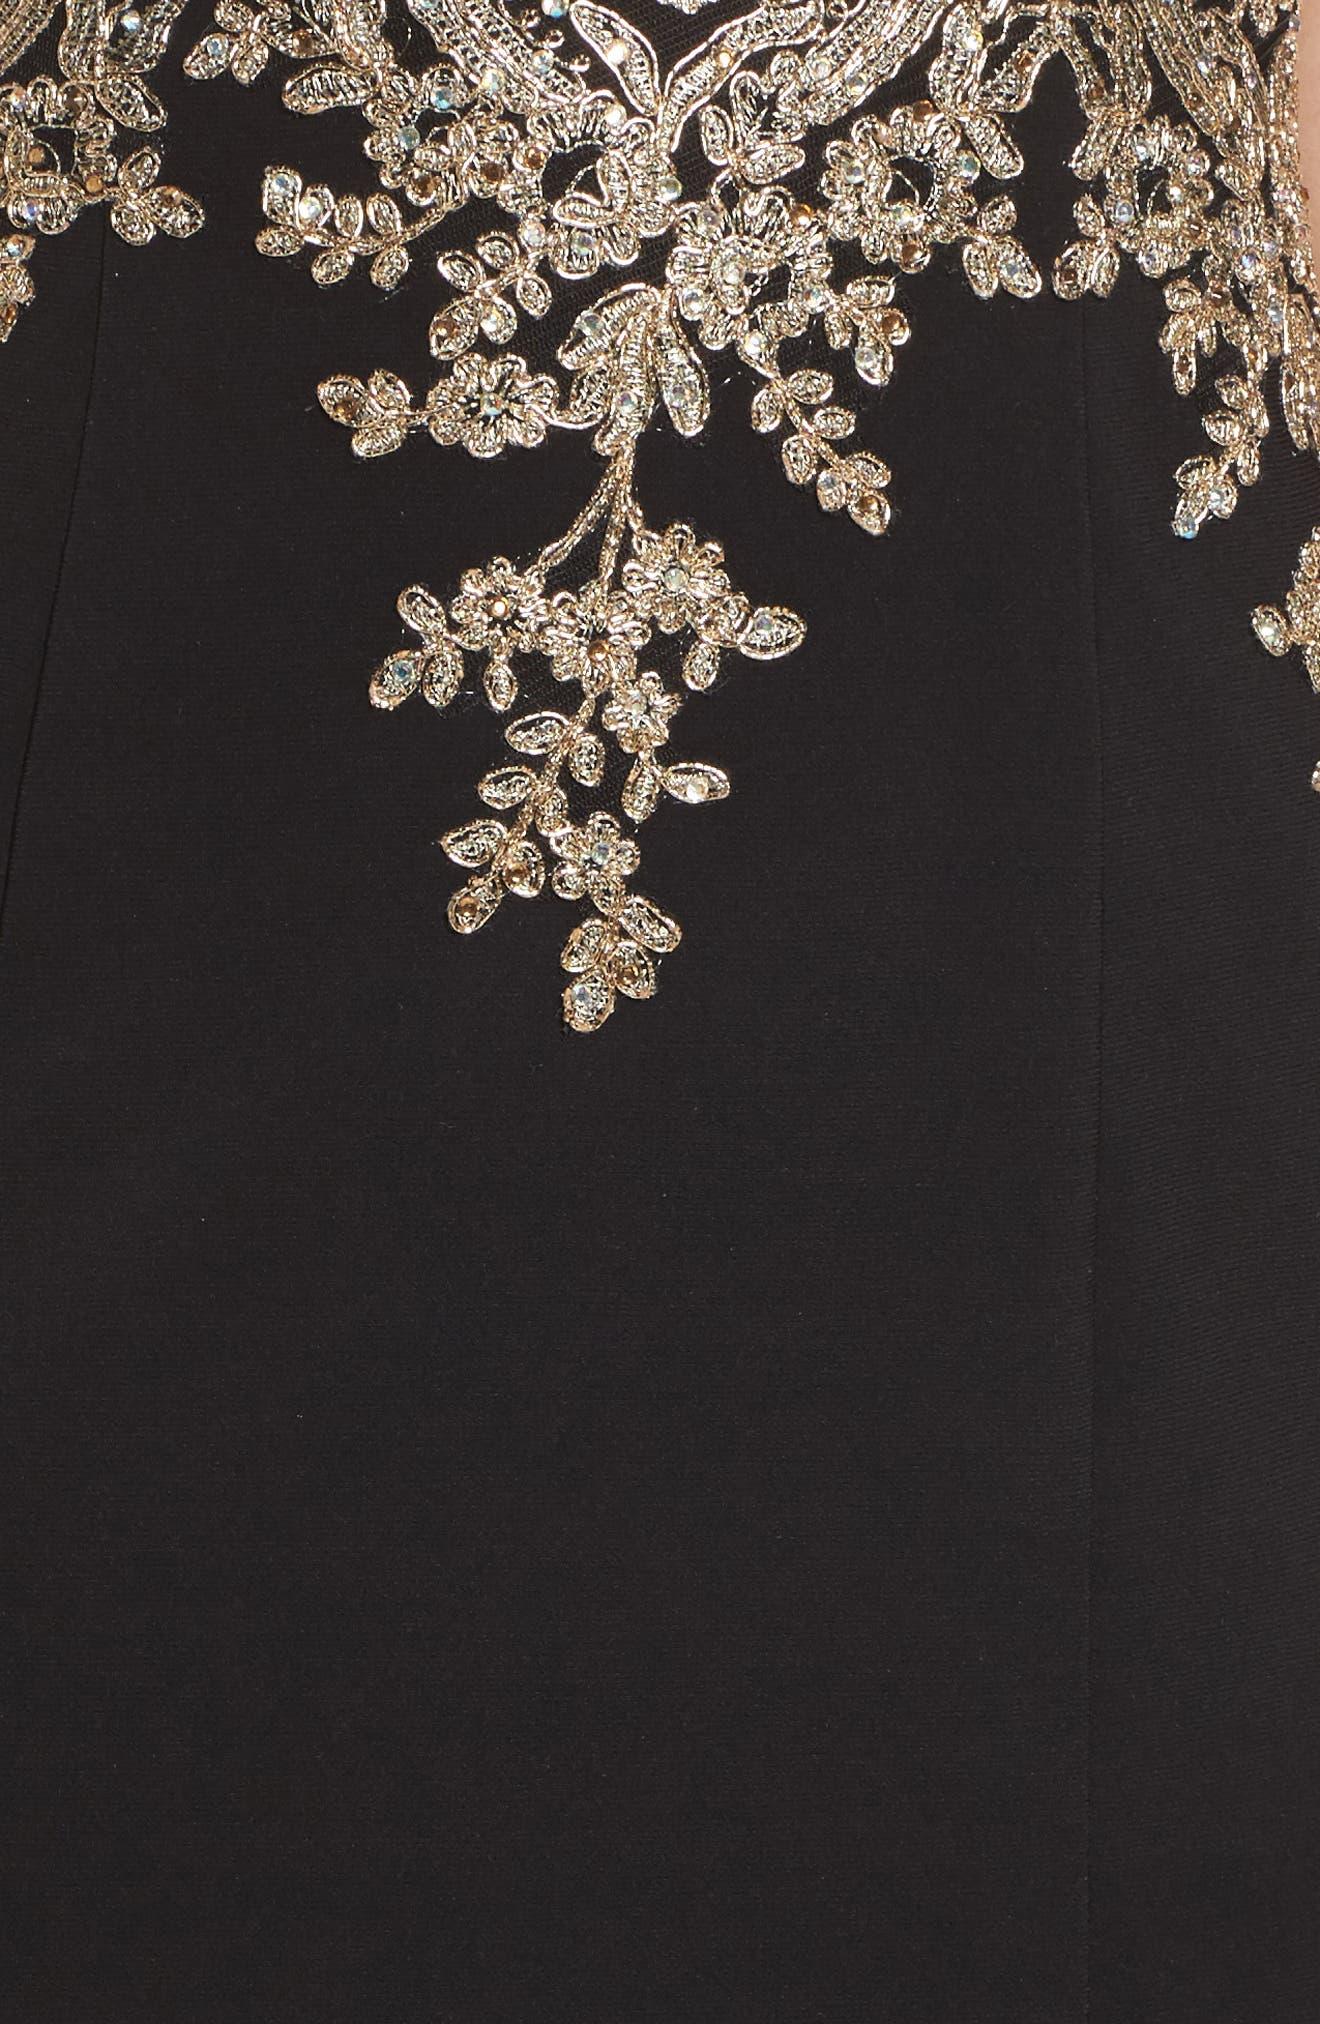 Corset Back Embellished Strapless Gown,                             Alternate thumbnail 5, color,                             Black/ Gold